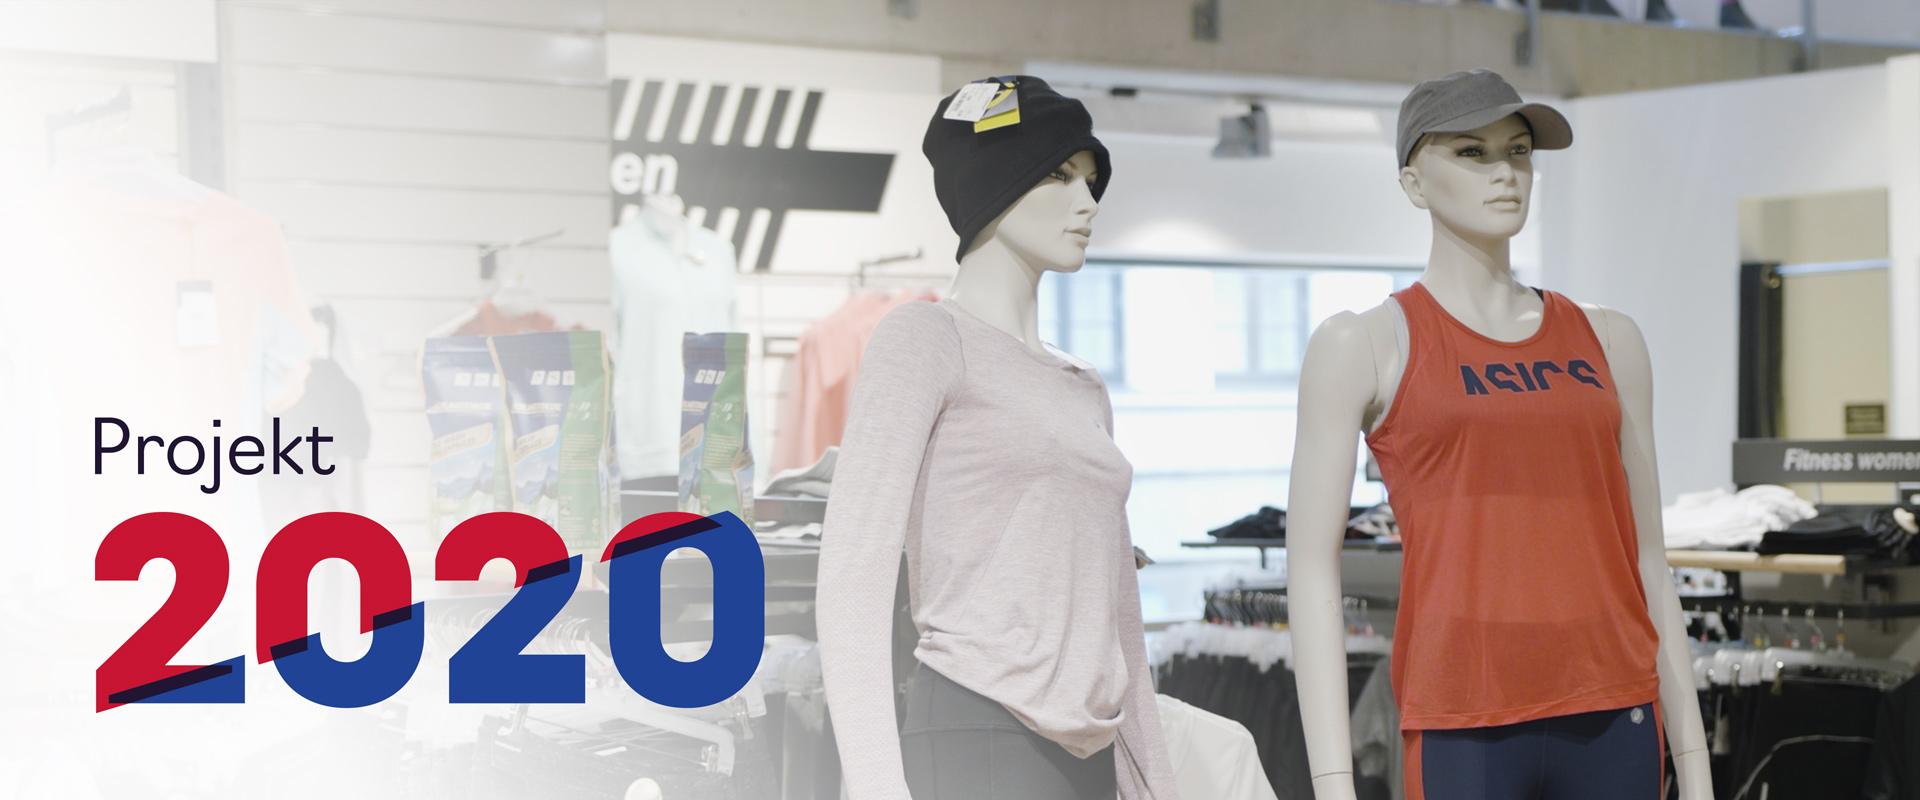 Projekt 2020 - Teil 8 Video